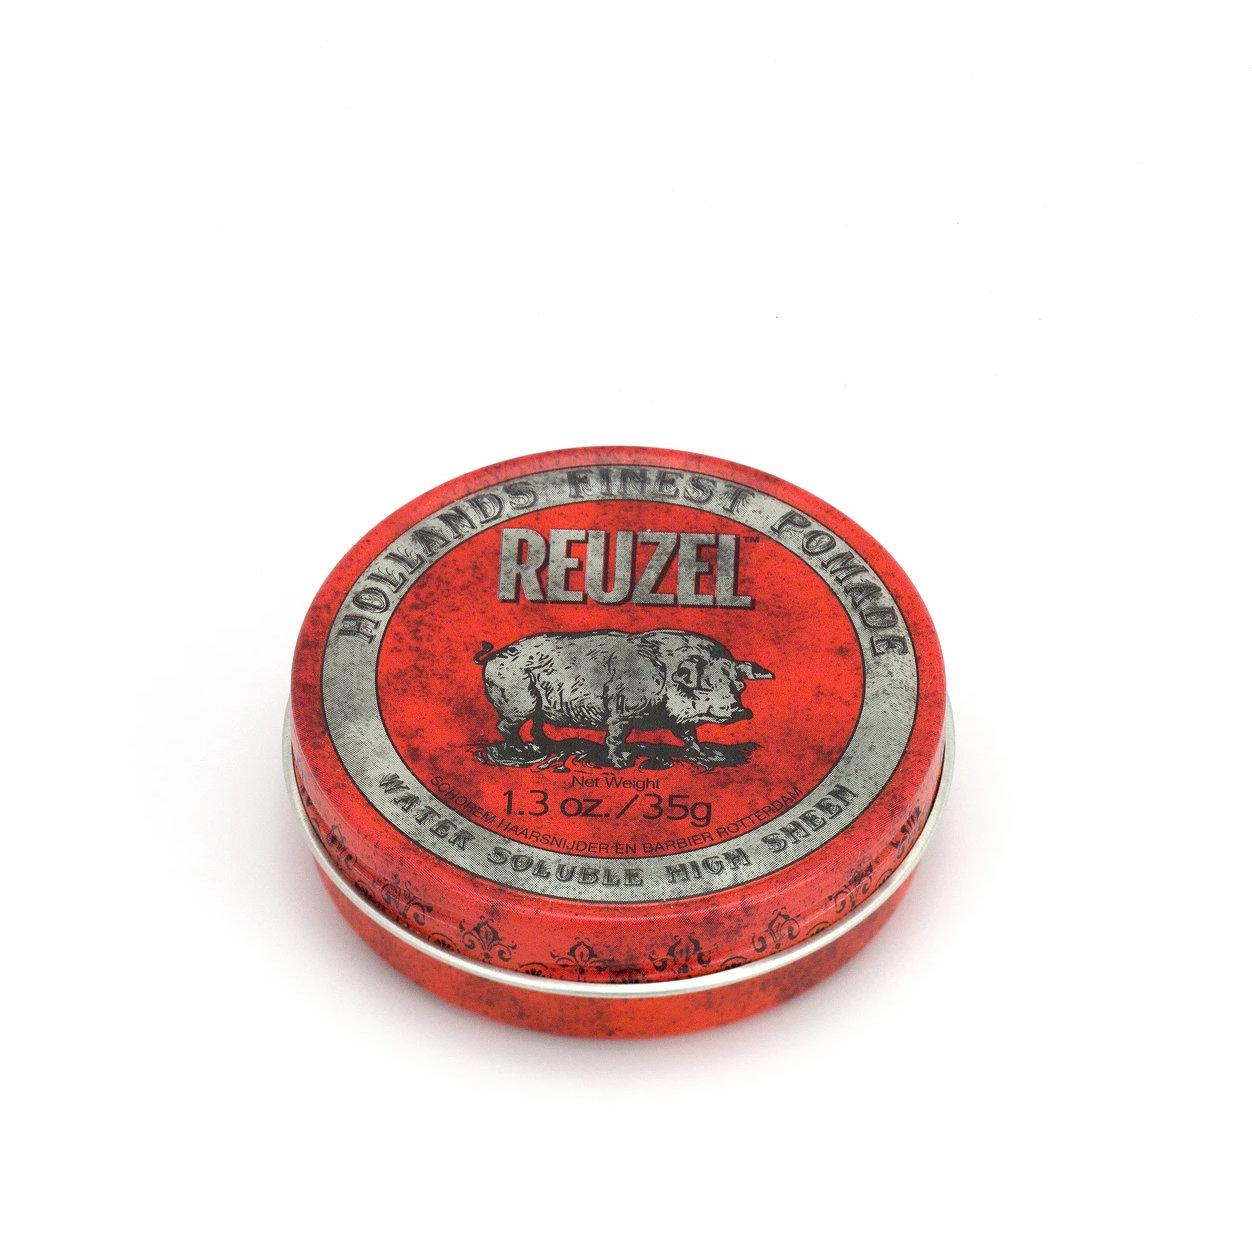 Tuotekuva: Reuzel Red – Water Soluble High Sheen Pomade (35 g) matkakoko